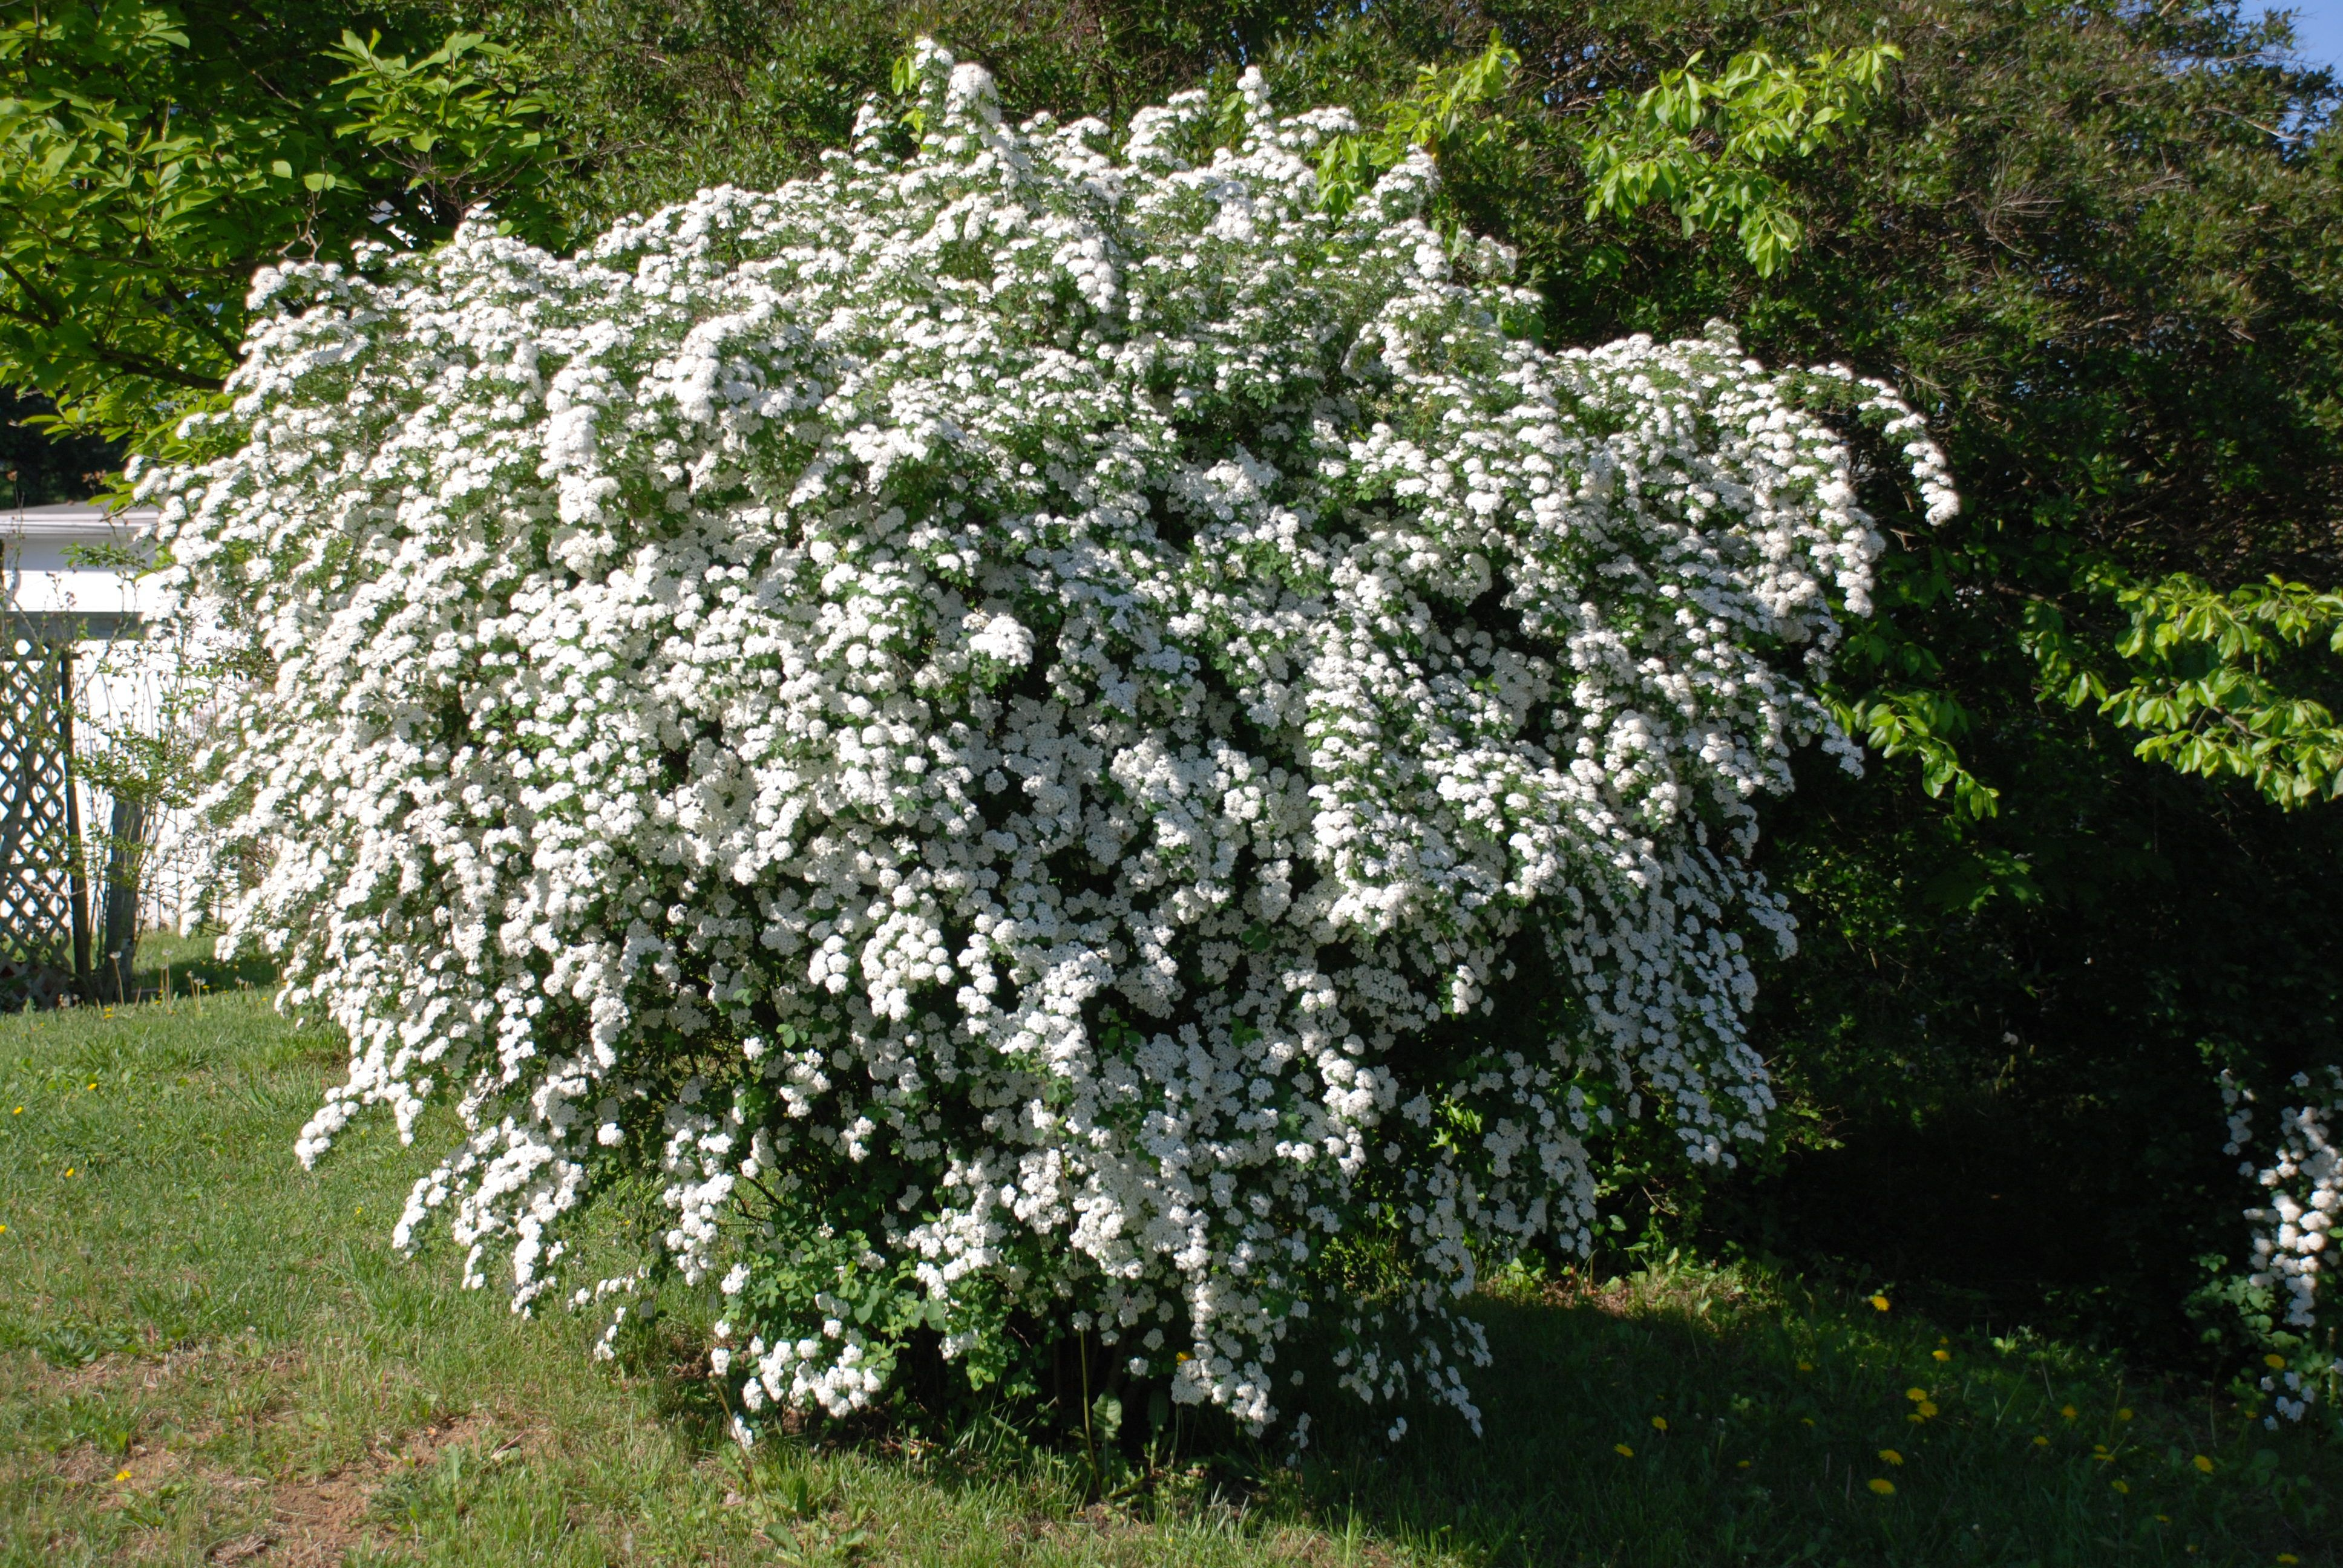 Wither Rod Viburnum Landscaping shrubs, Shrubs, Plants